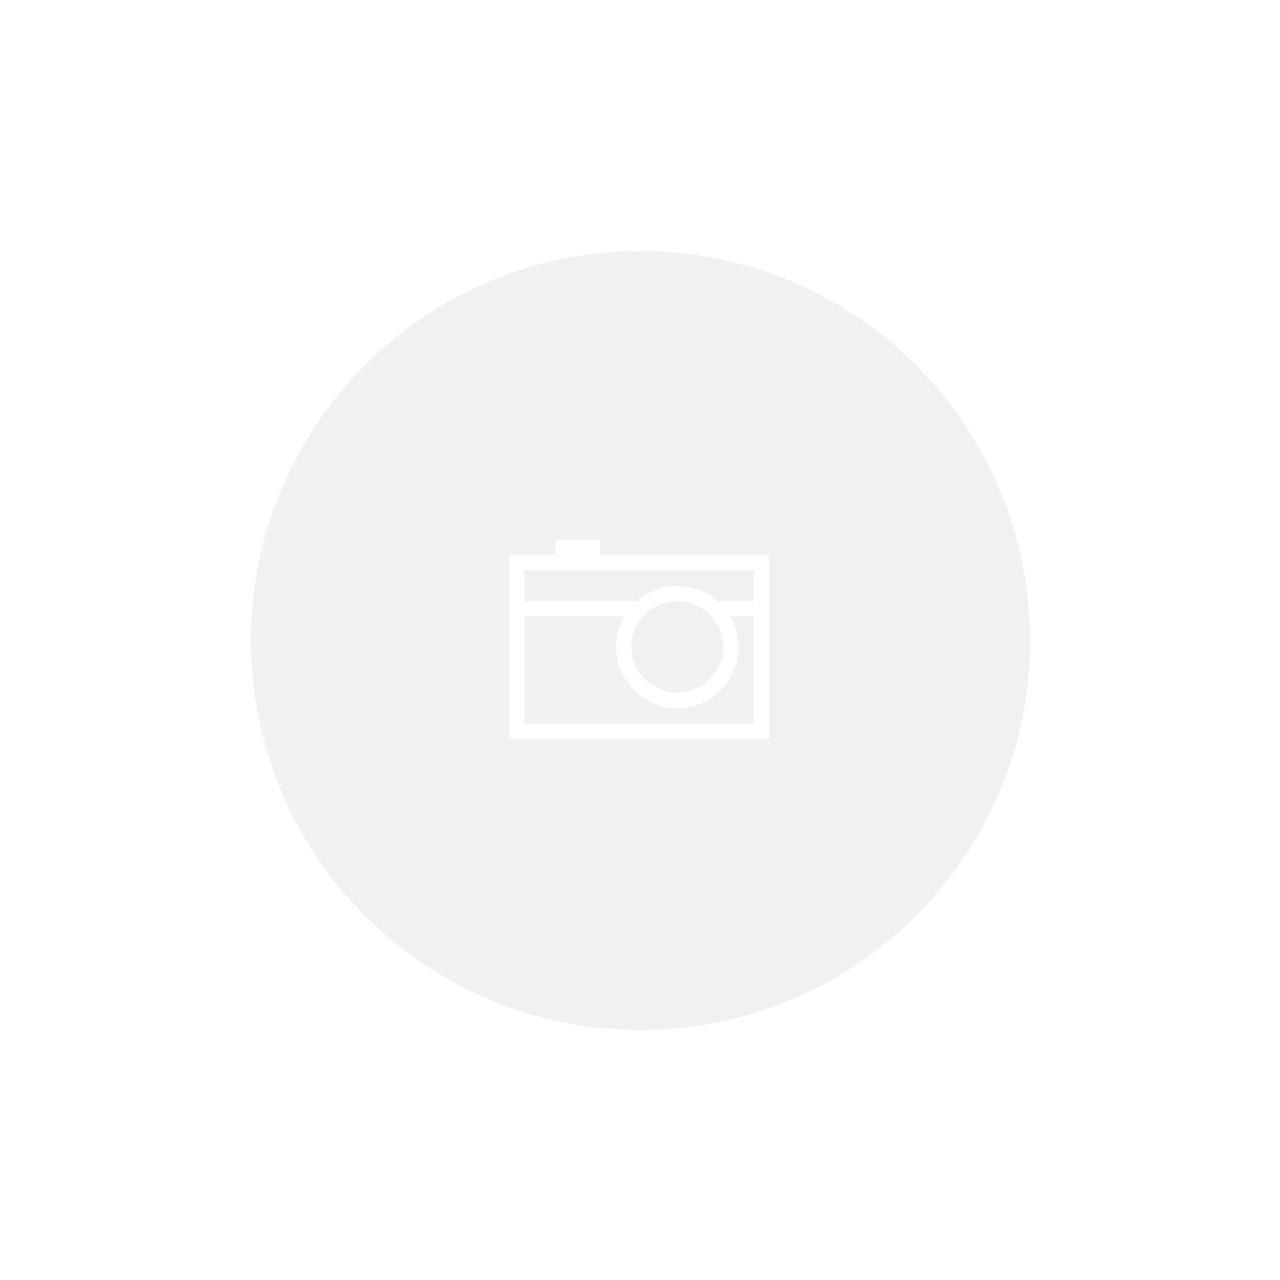 Kit de Lâminas de Tosa 10 Peças - Lâminas de Tosa Oster nº 40, 30, 15, 10, 7F, 5F, 4F, 3F, 5/8 + Estojo